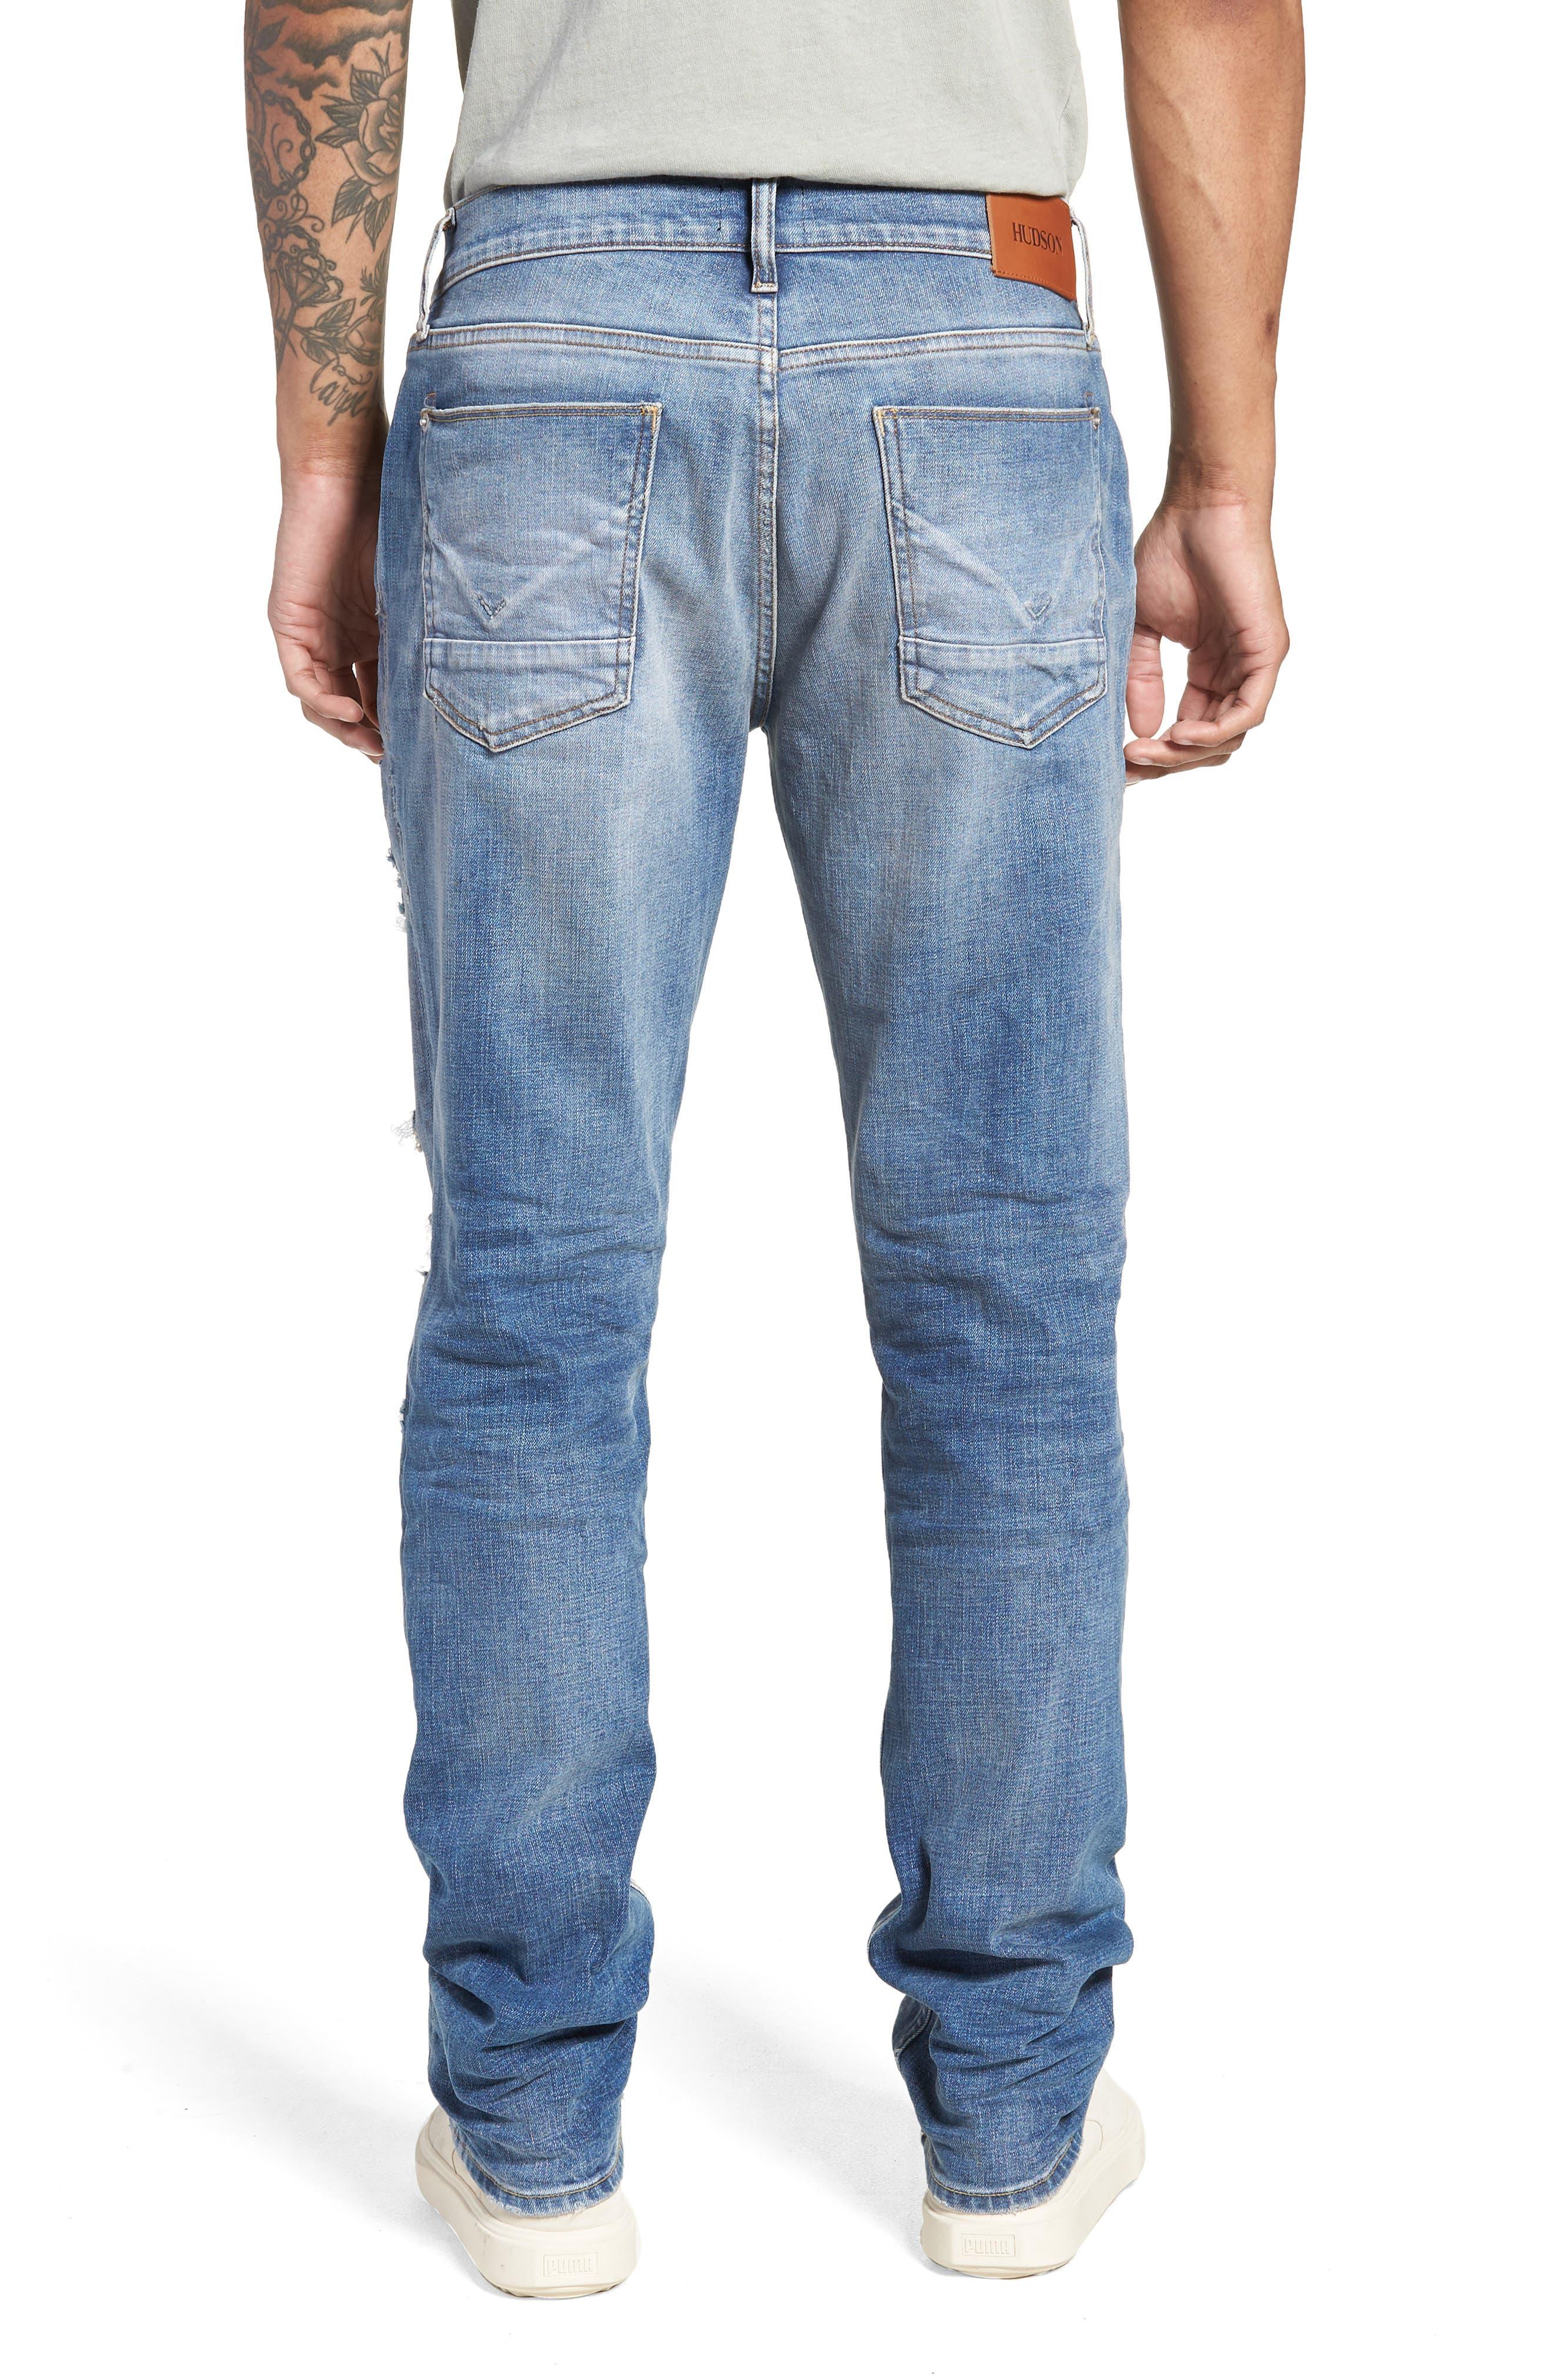 Blake Slim Fit Jeans,                             Alternate thumbnail 2, color,                             Eagle Rock